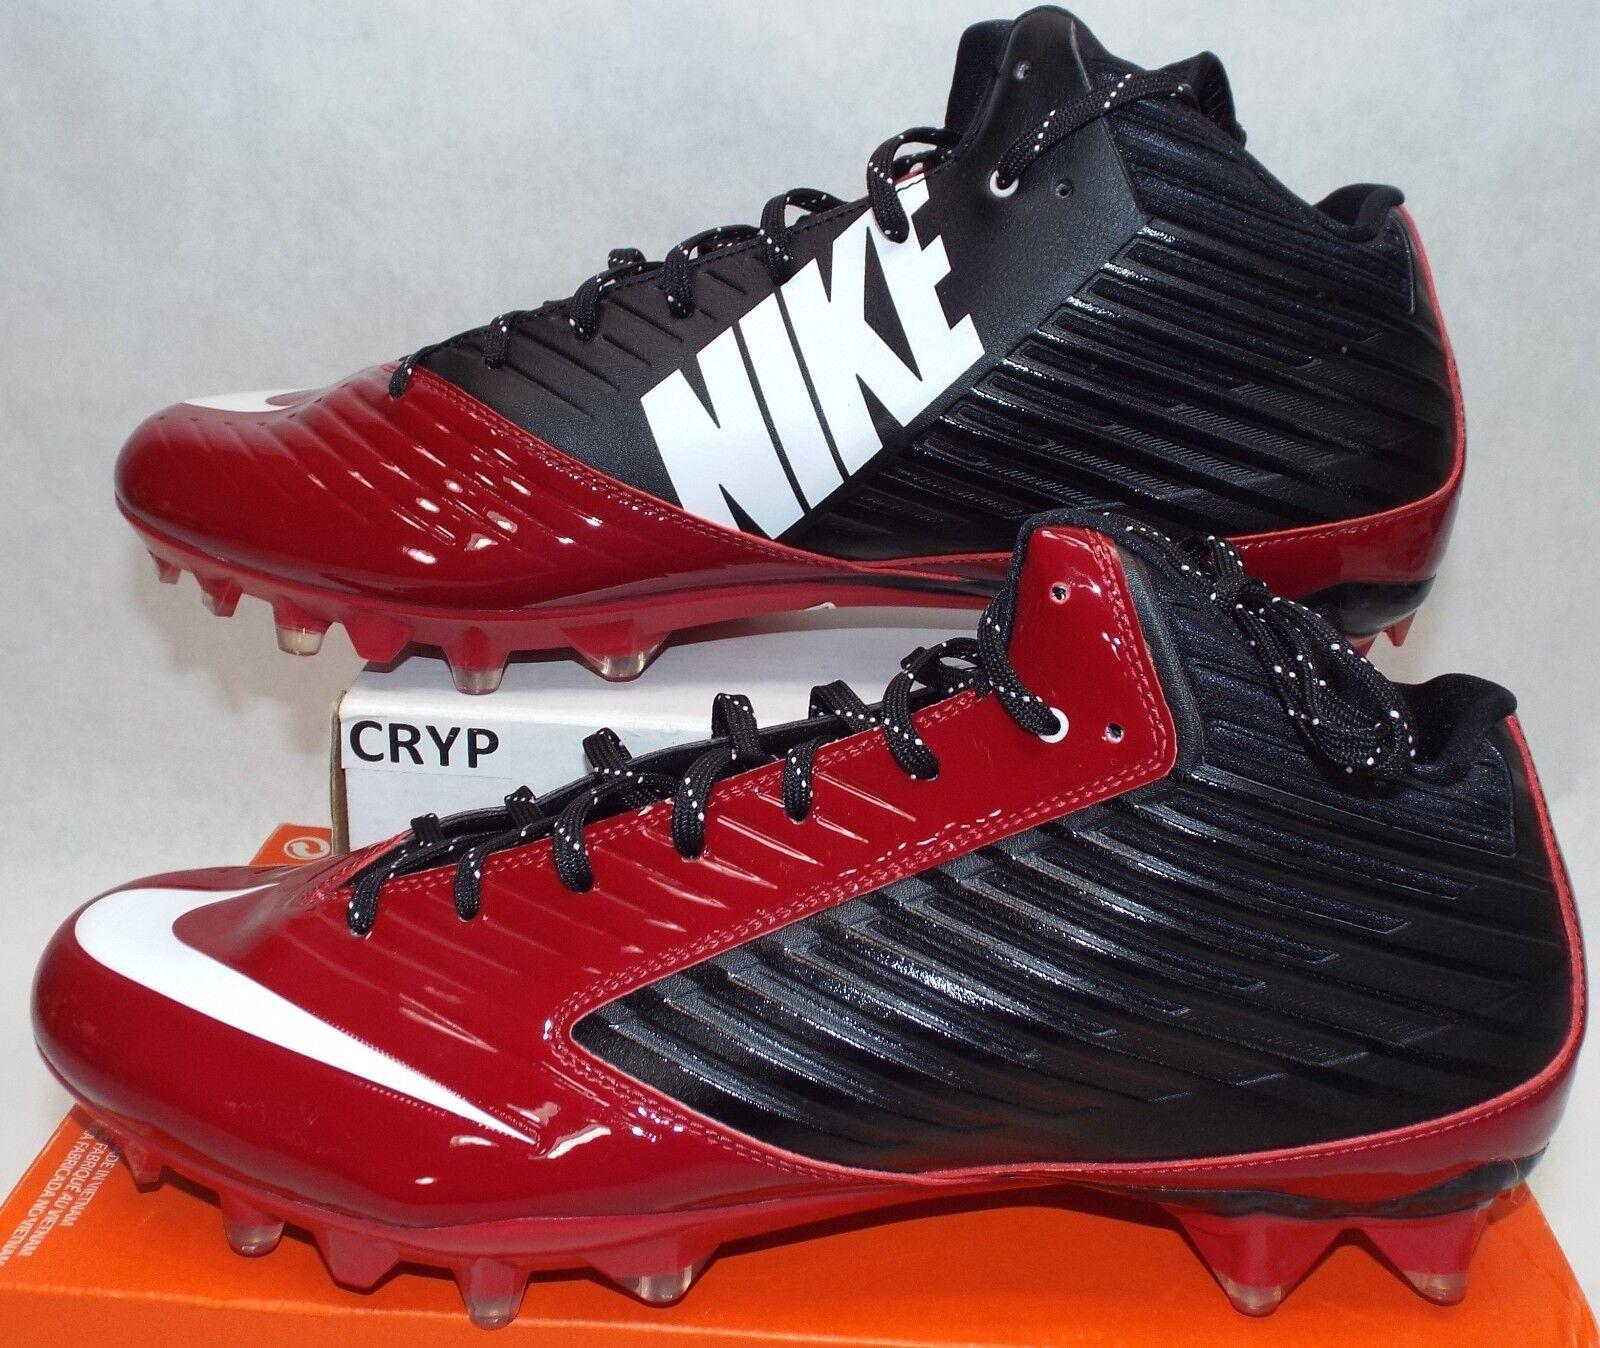 New Mens 15 NIKE Vapor Speed 3 4 TD Tough Maroon Football Cleats  120 668839-001